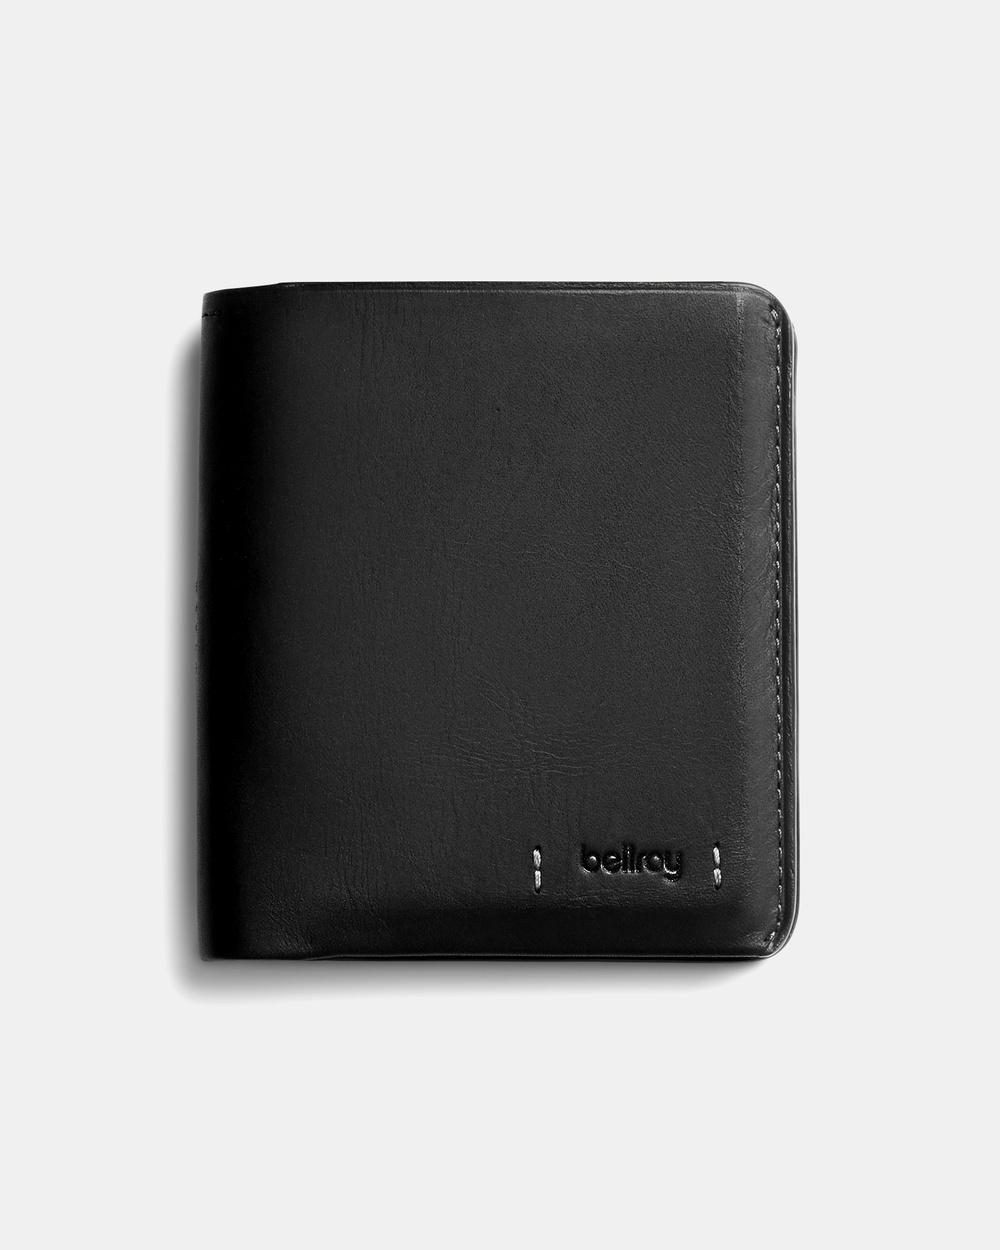 Bellroy Note Sleeve Premium Wallets Black